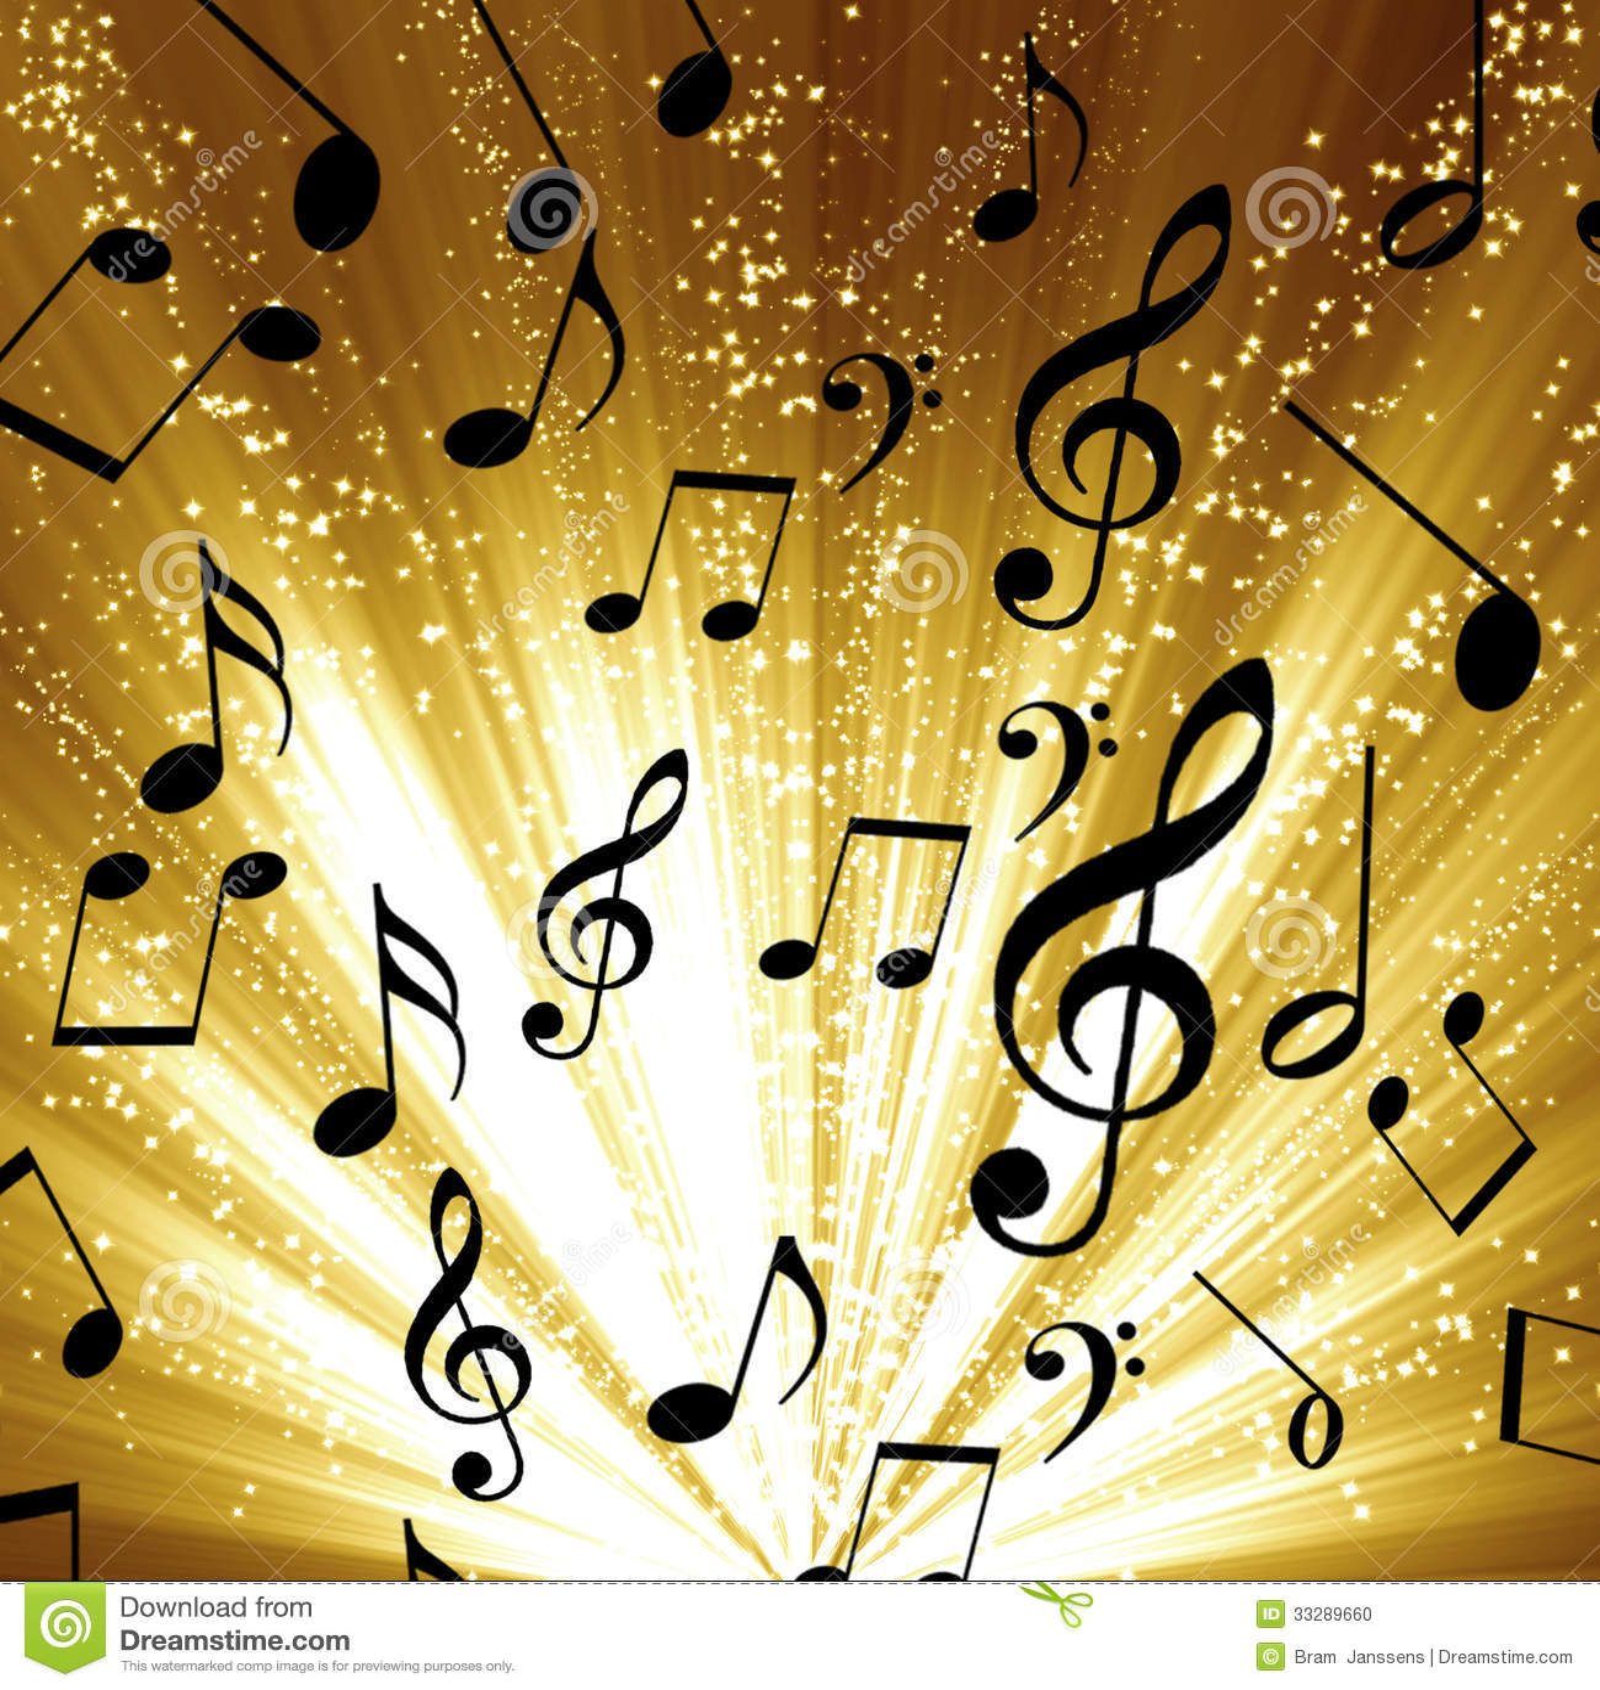 Music Notes Stock Photo Image 33289660